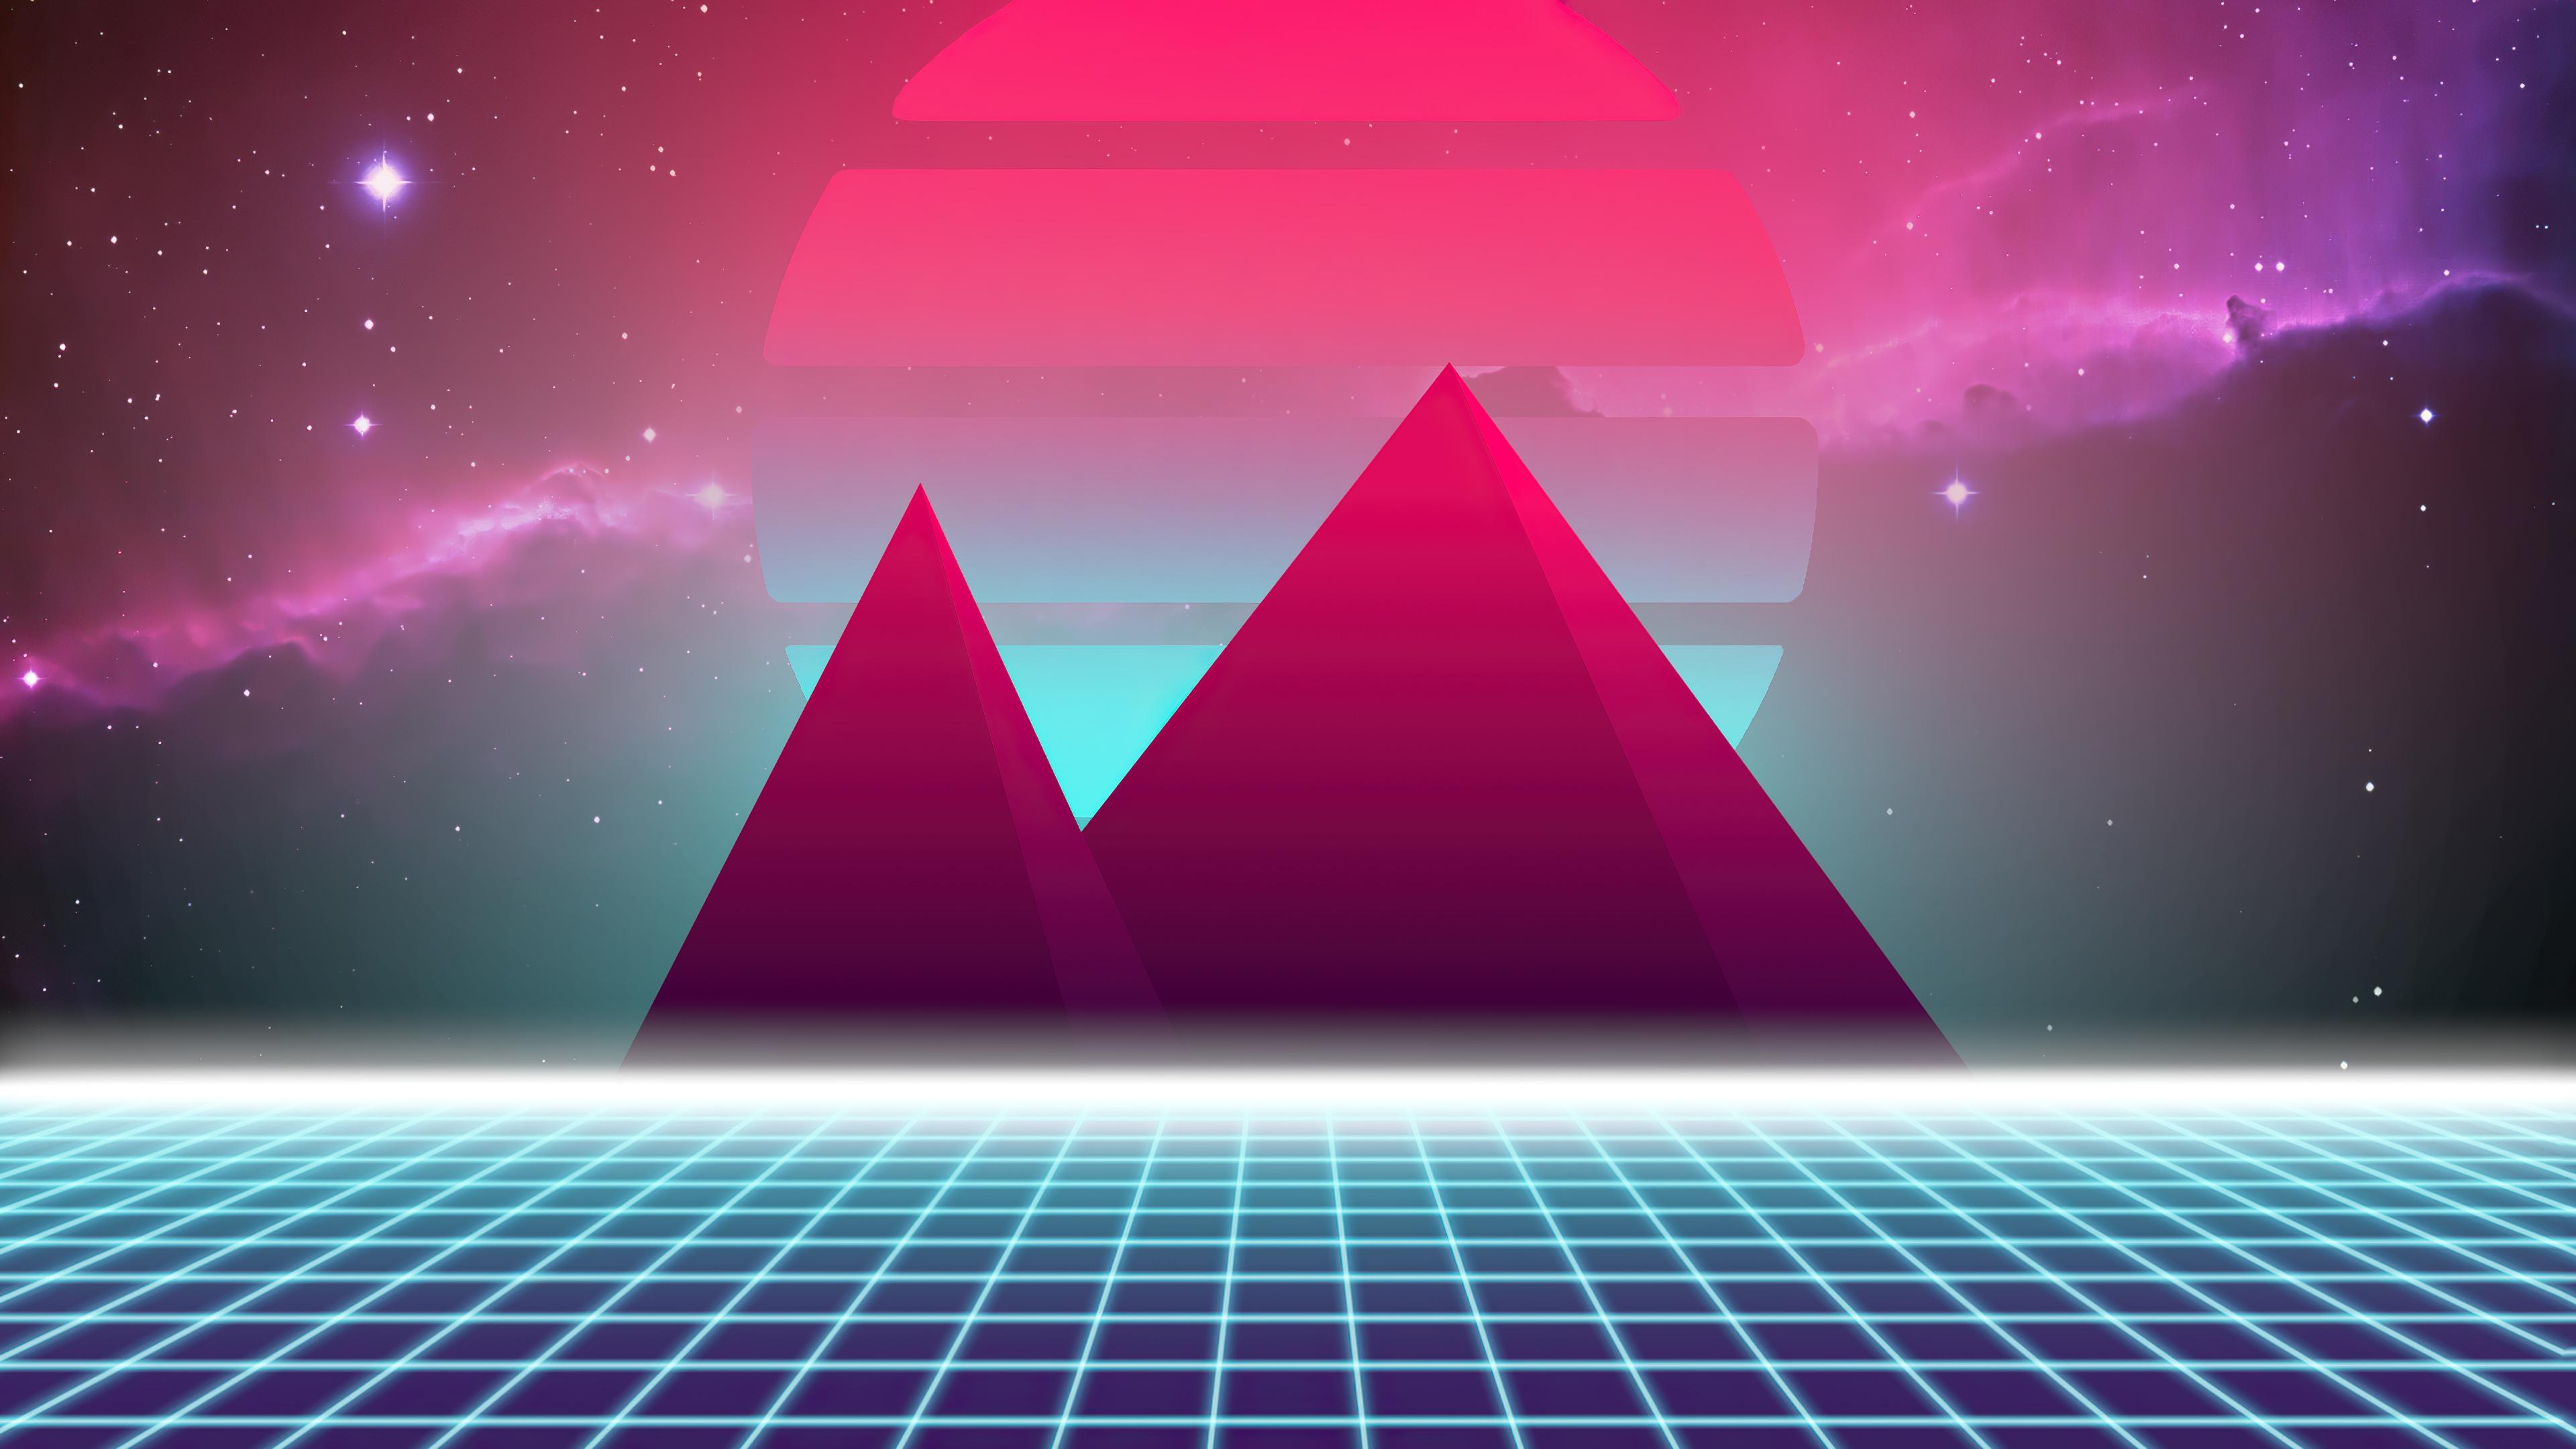 retrowave pyramid in space 4k 1634170967 - Retrowave Pyramid In Space 4k - Retrowave Pyramid In Space wallpapers, Retrowave Pyramid In Space 4k wallpapers